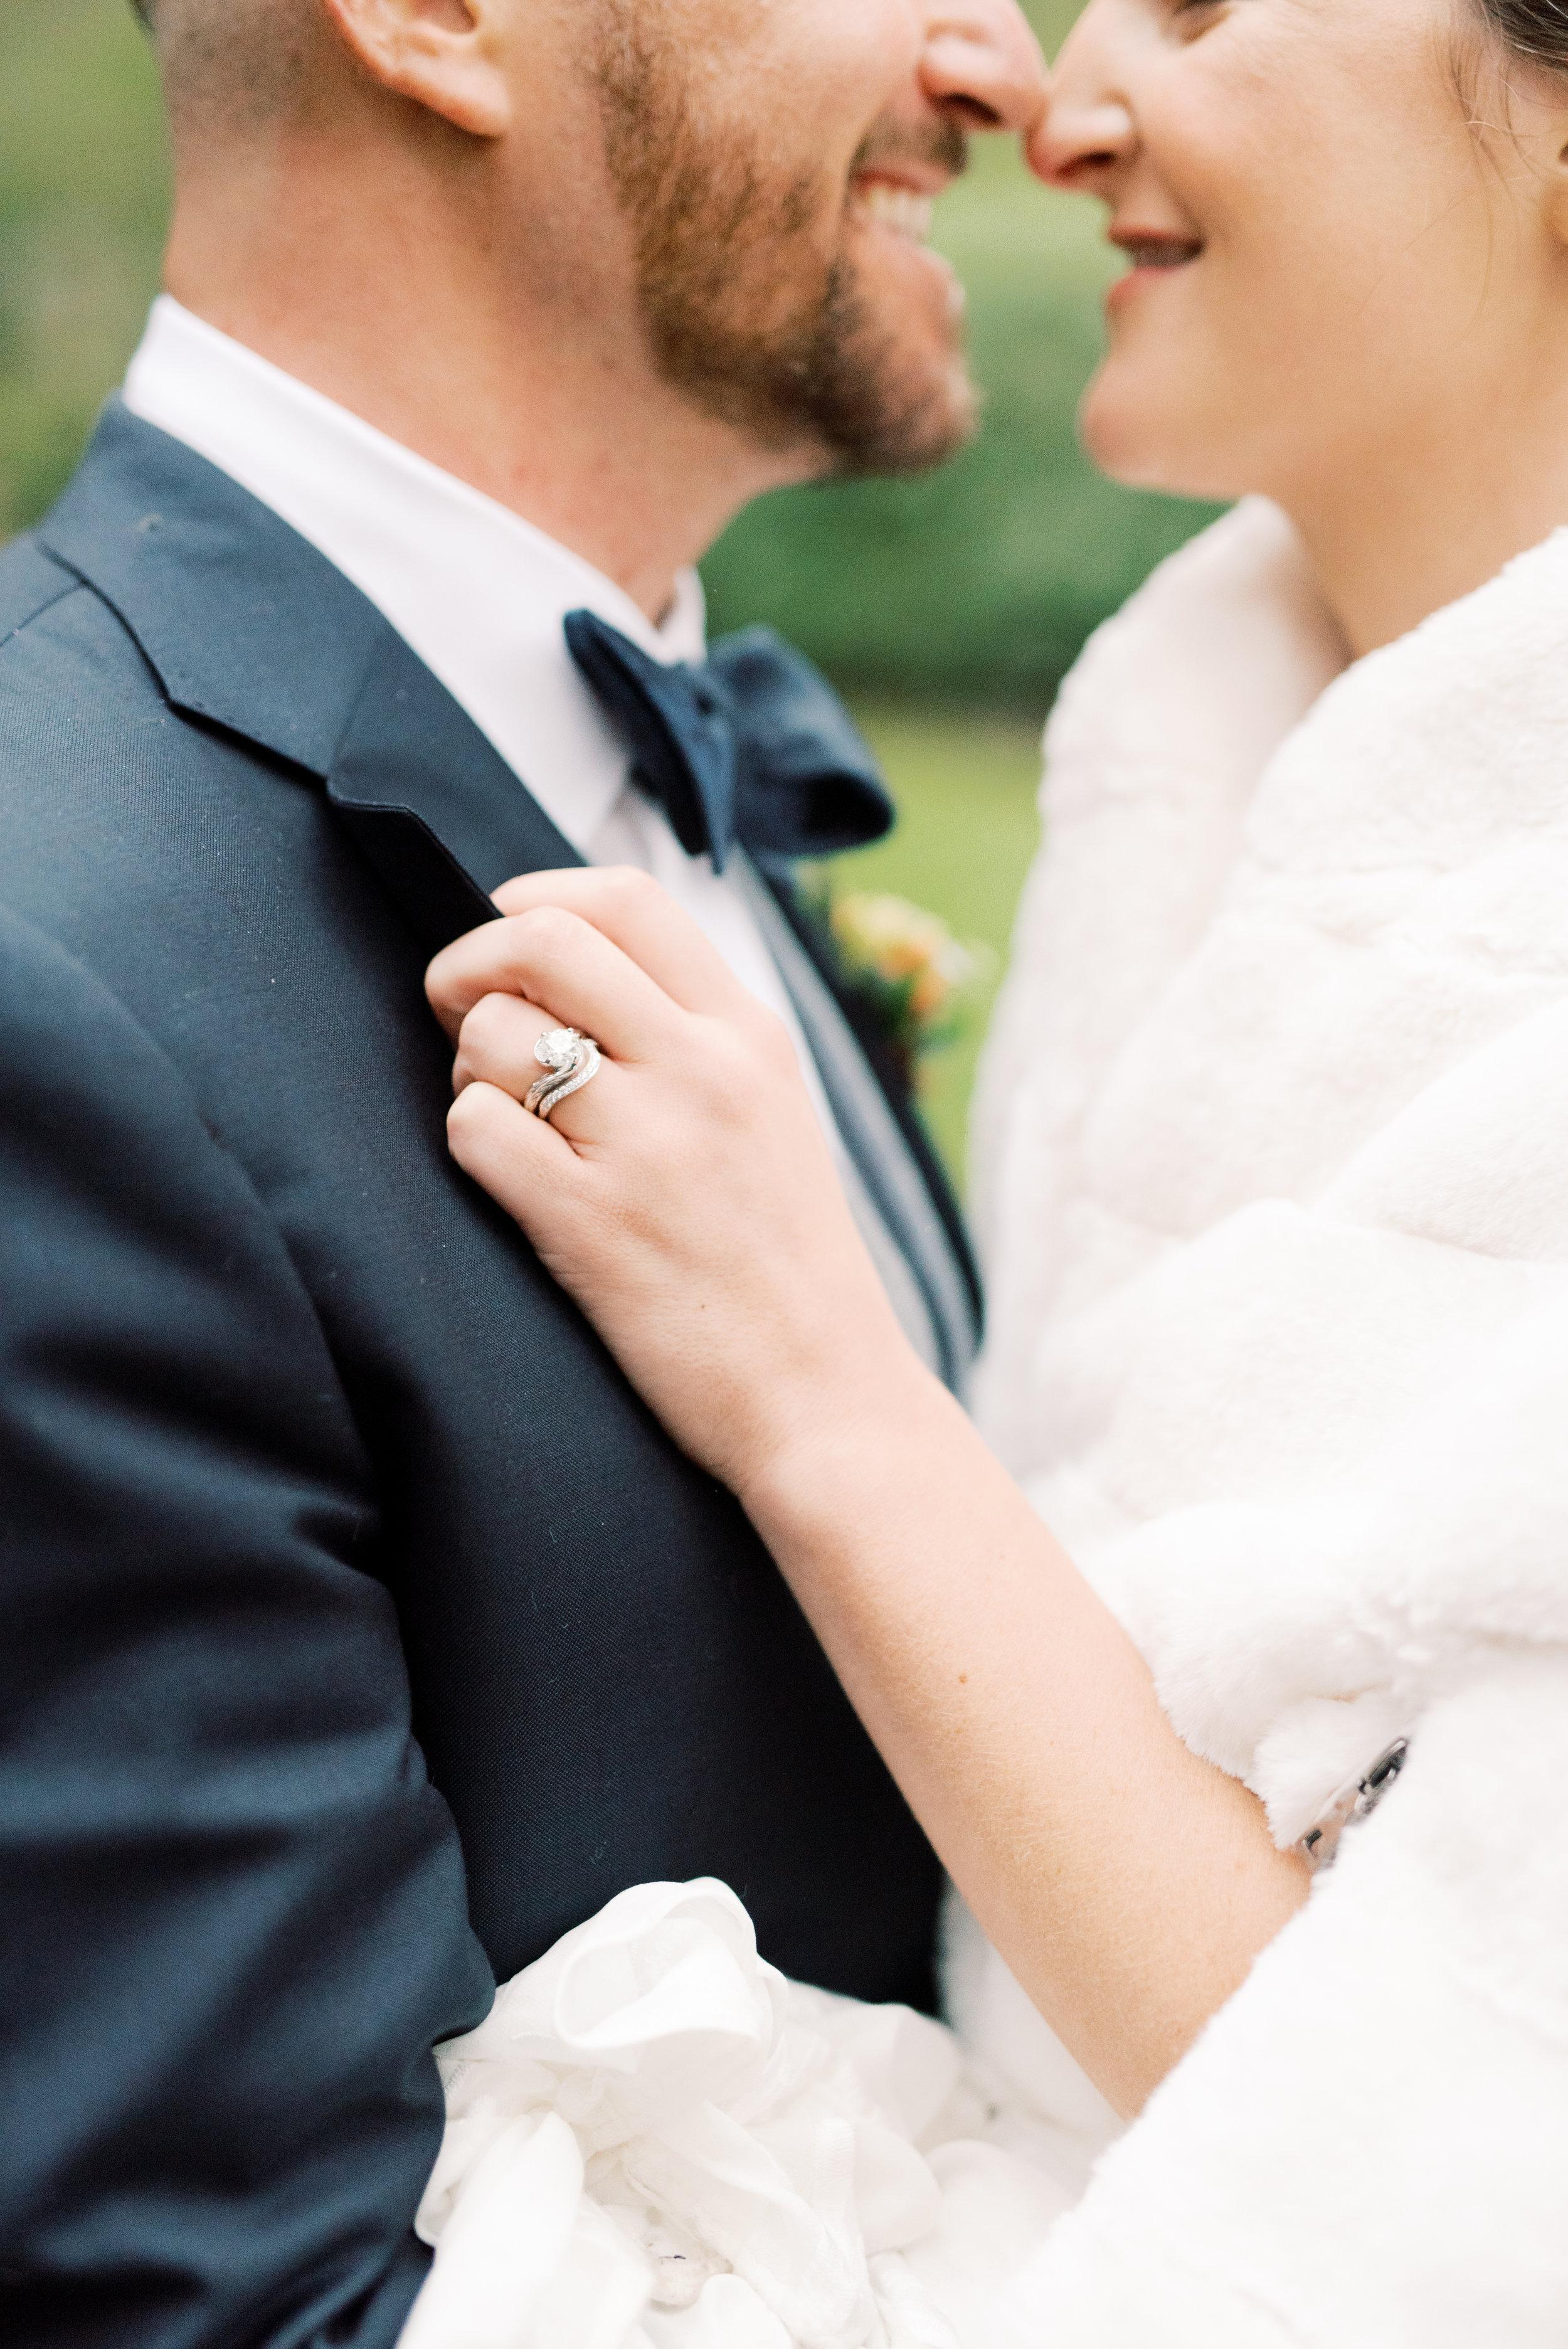 haley-richter-photography-october-pomme-wedding-in-radnor-070.jpg